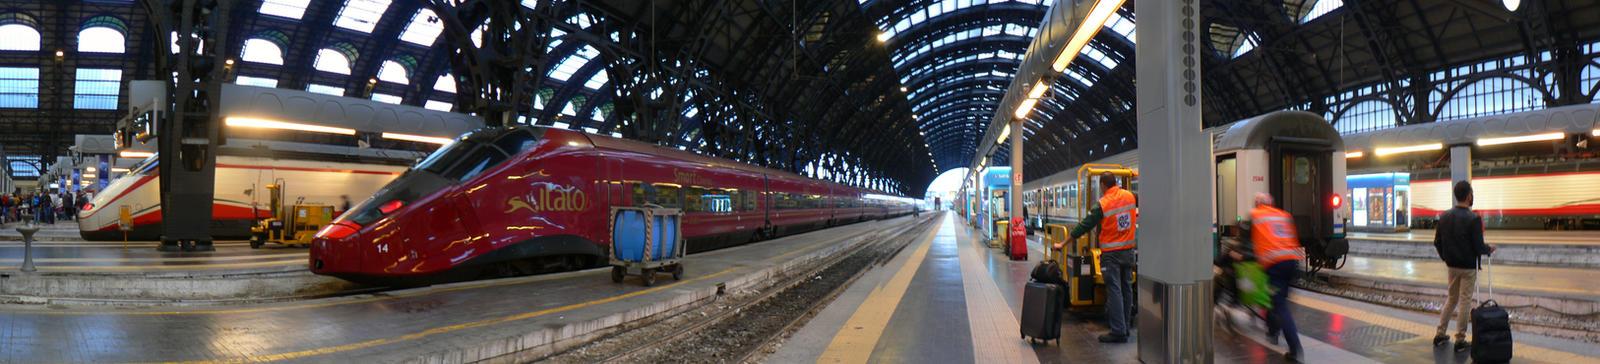 Milano  Train station Centrale by GBLXVIII